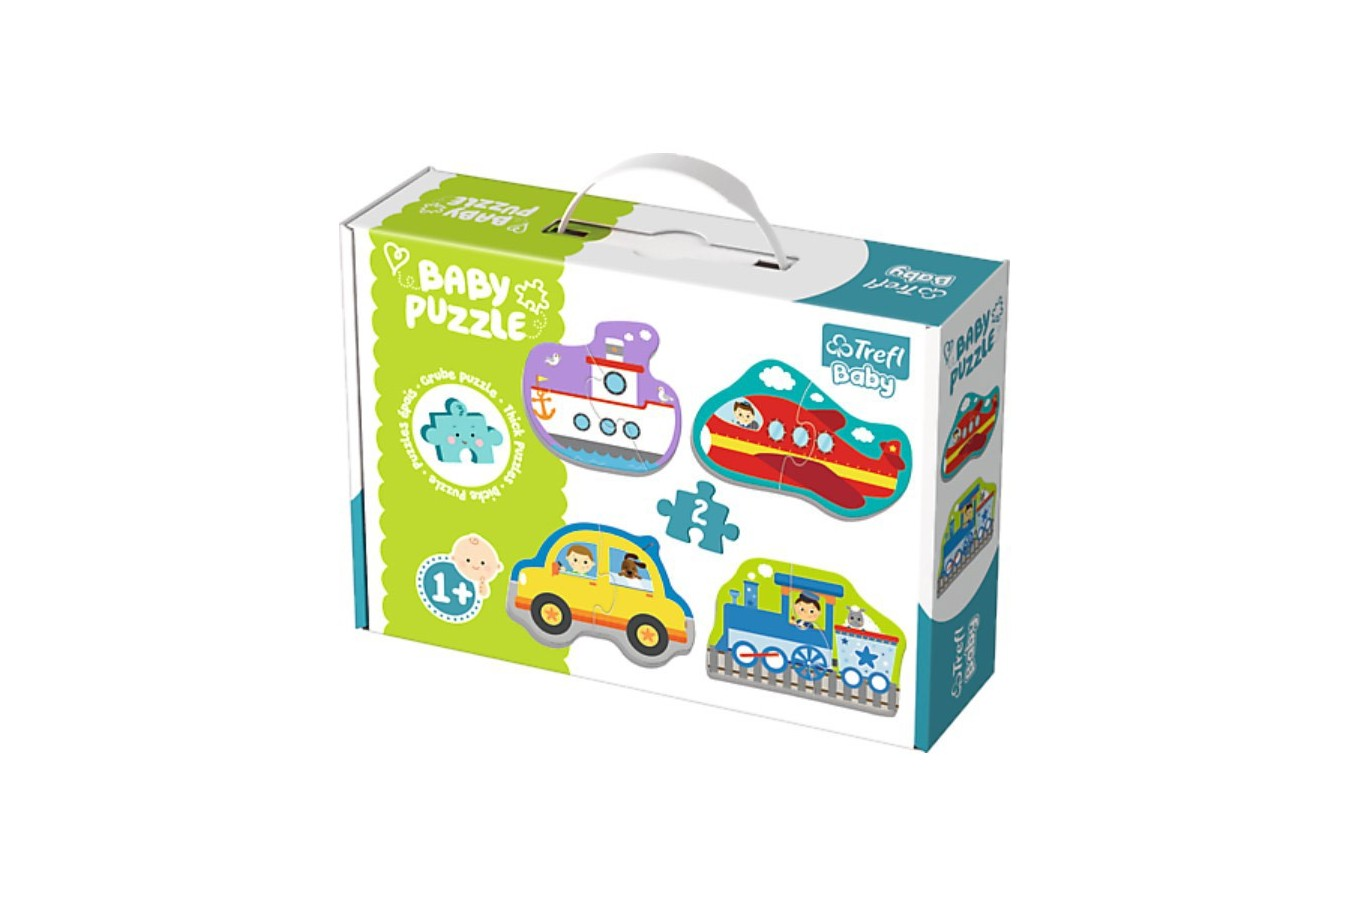 Puzzle Trefl - Baby Puzzles, 4x2 piese (64898)